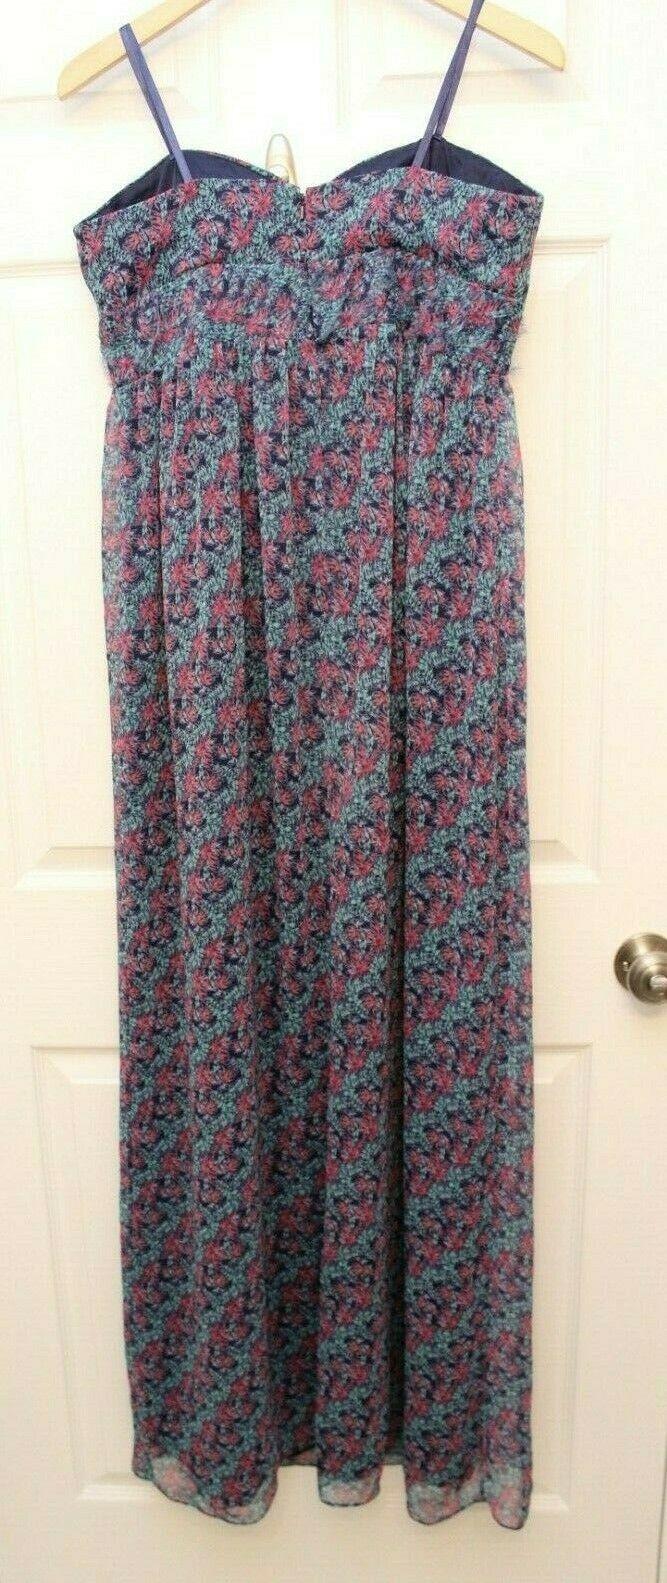 BCBG BCBGeneration Sz 12 Blue Floral Leaf Printed Strapless Maxi Dress